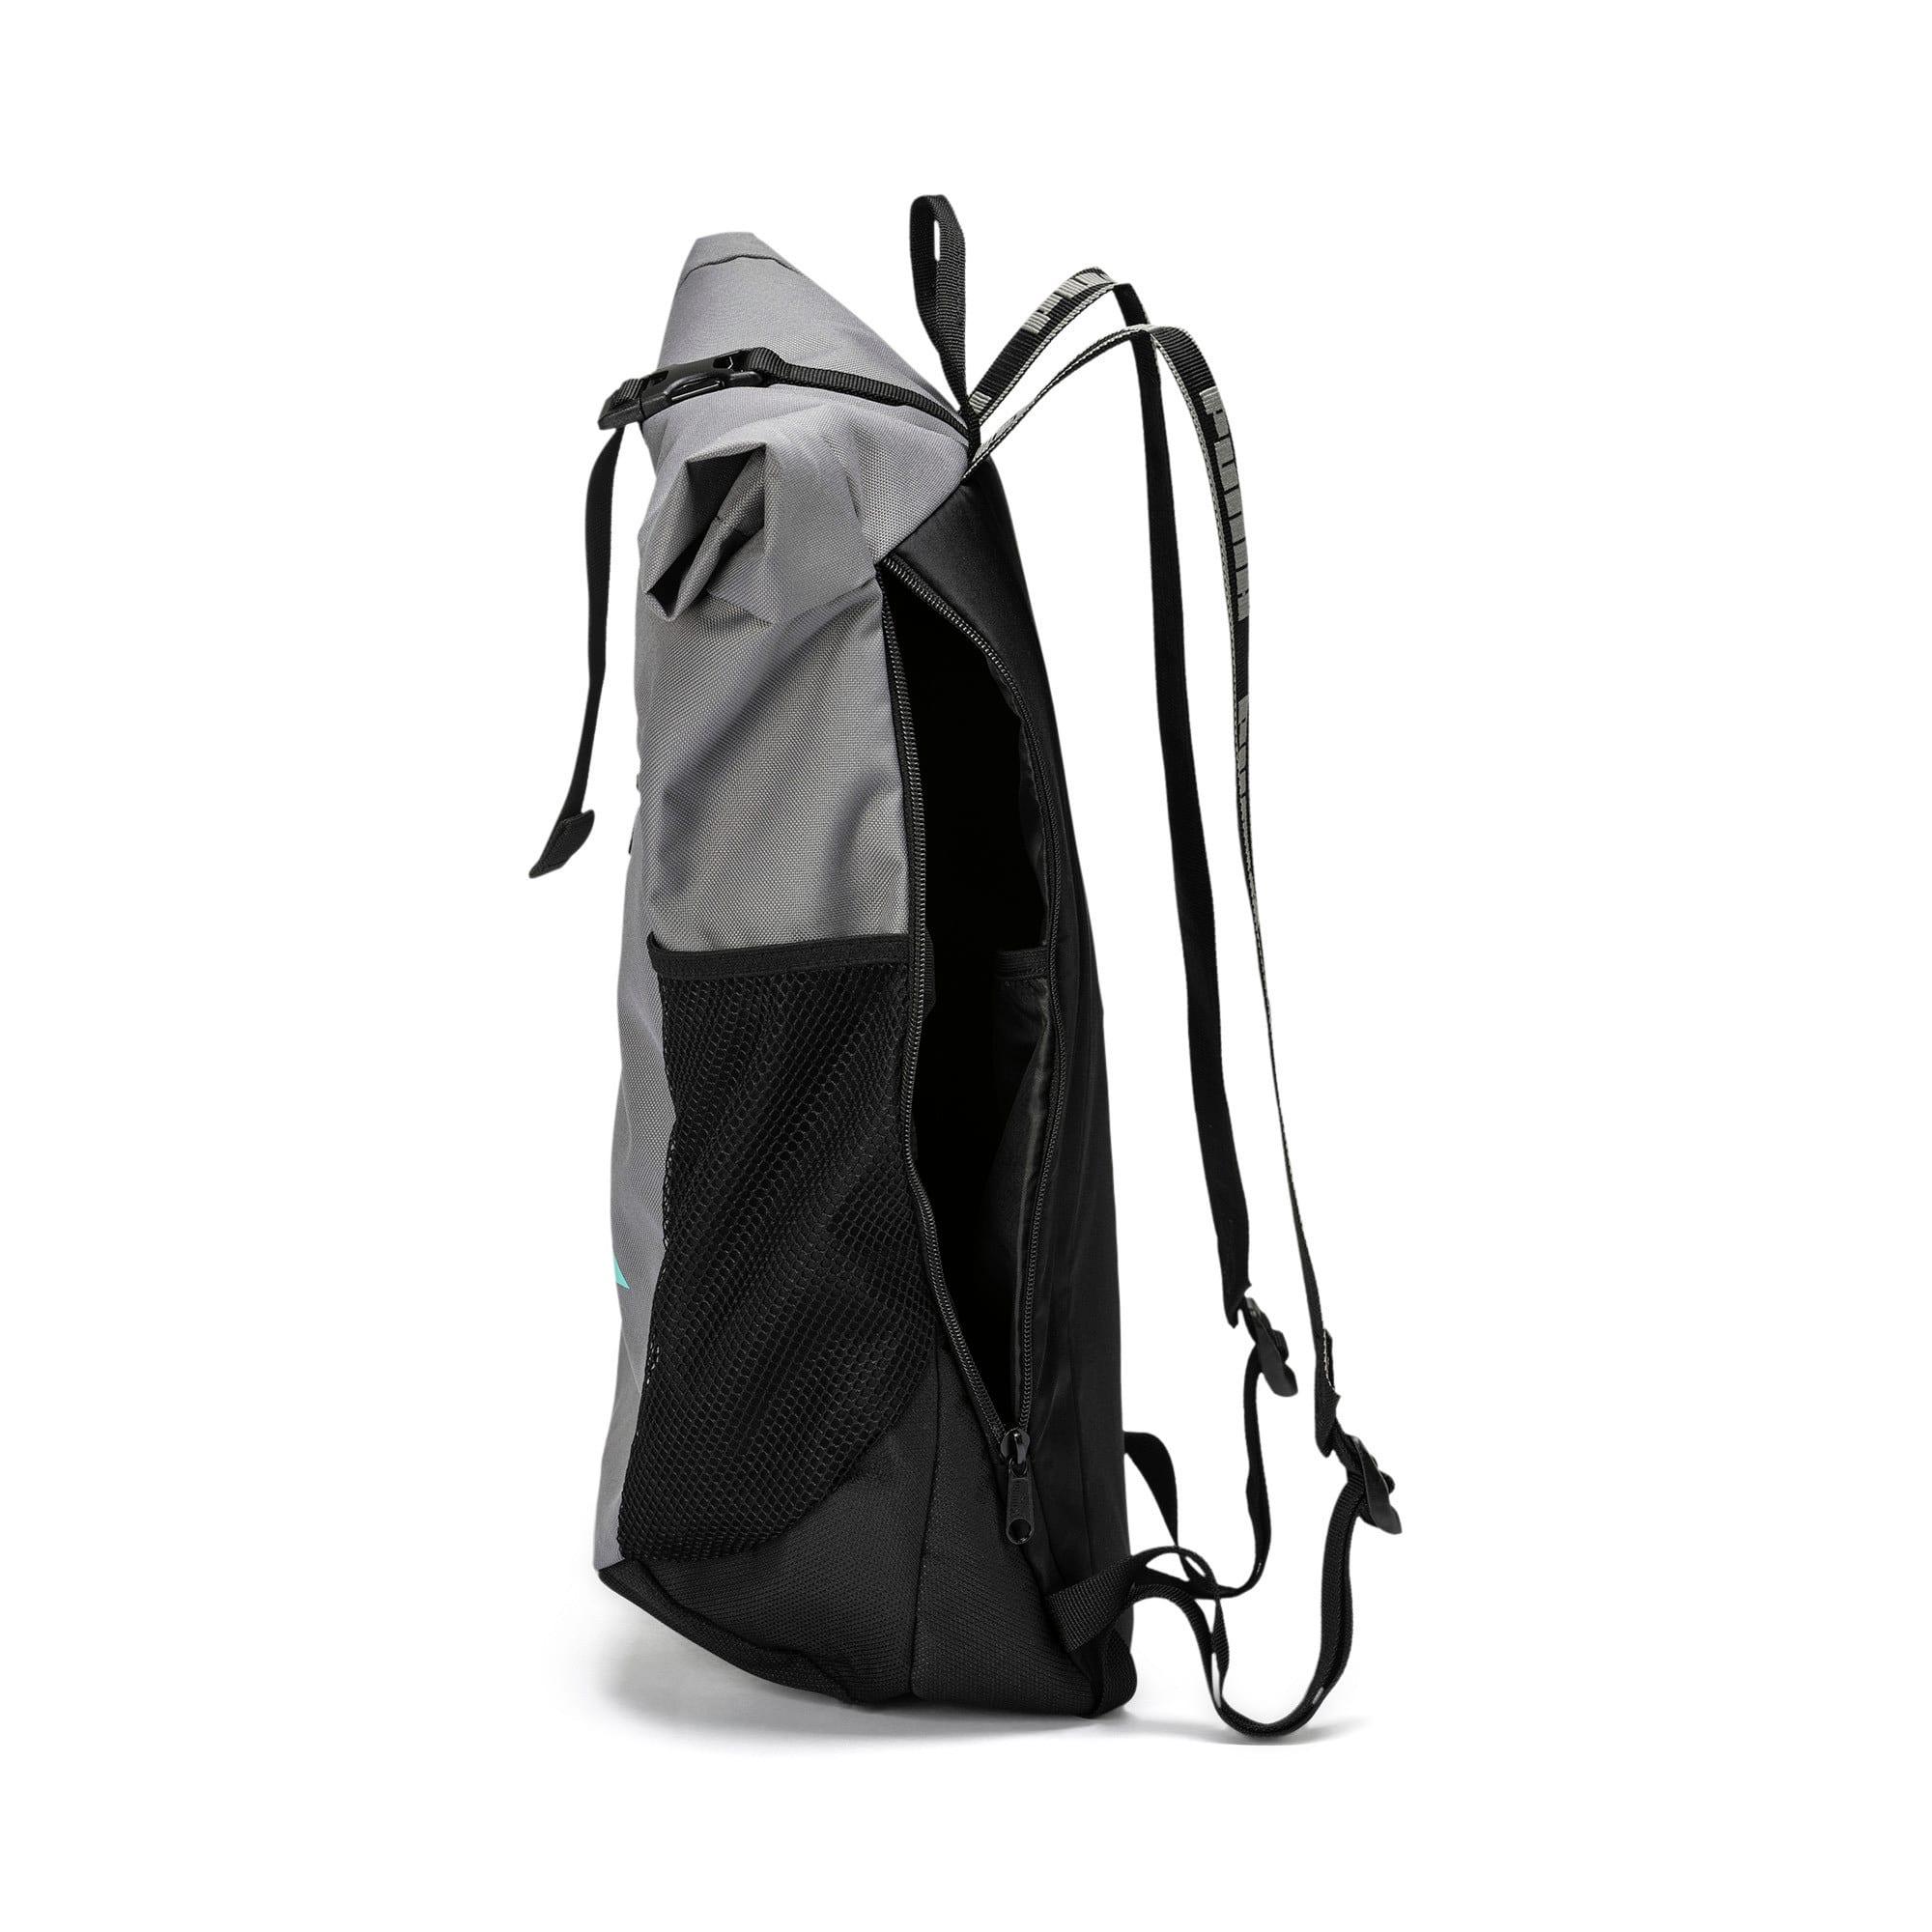 Thumbnail 3 of Sole Backpack, CASTLEROCK, medium-IND